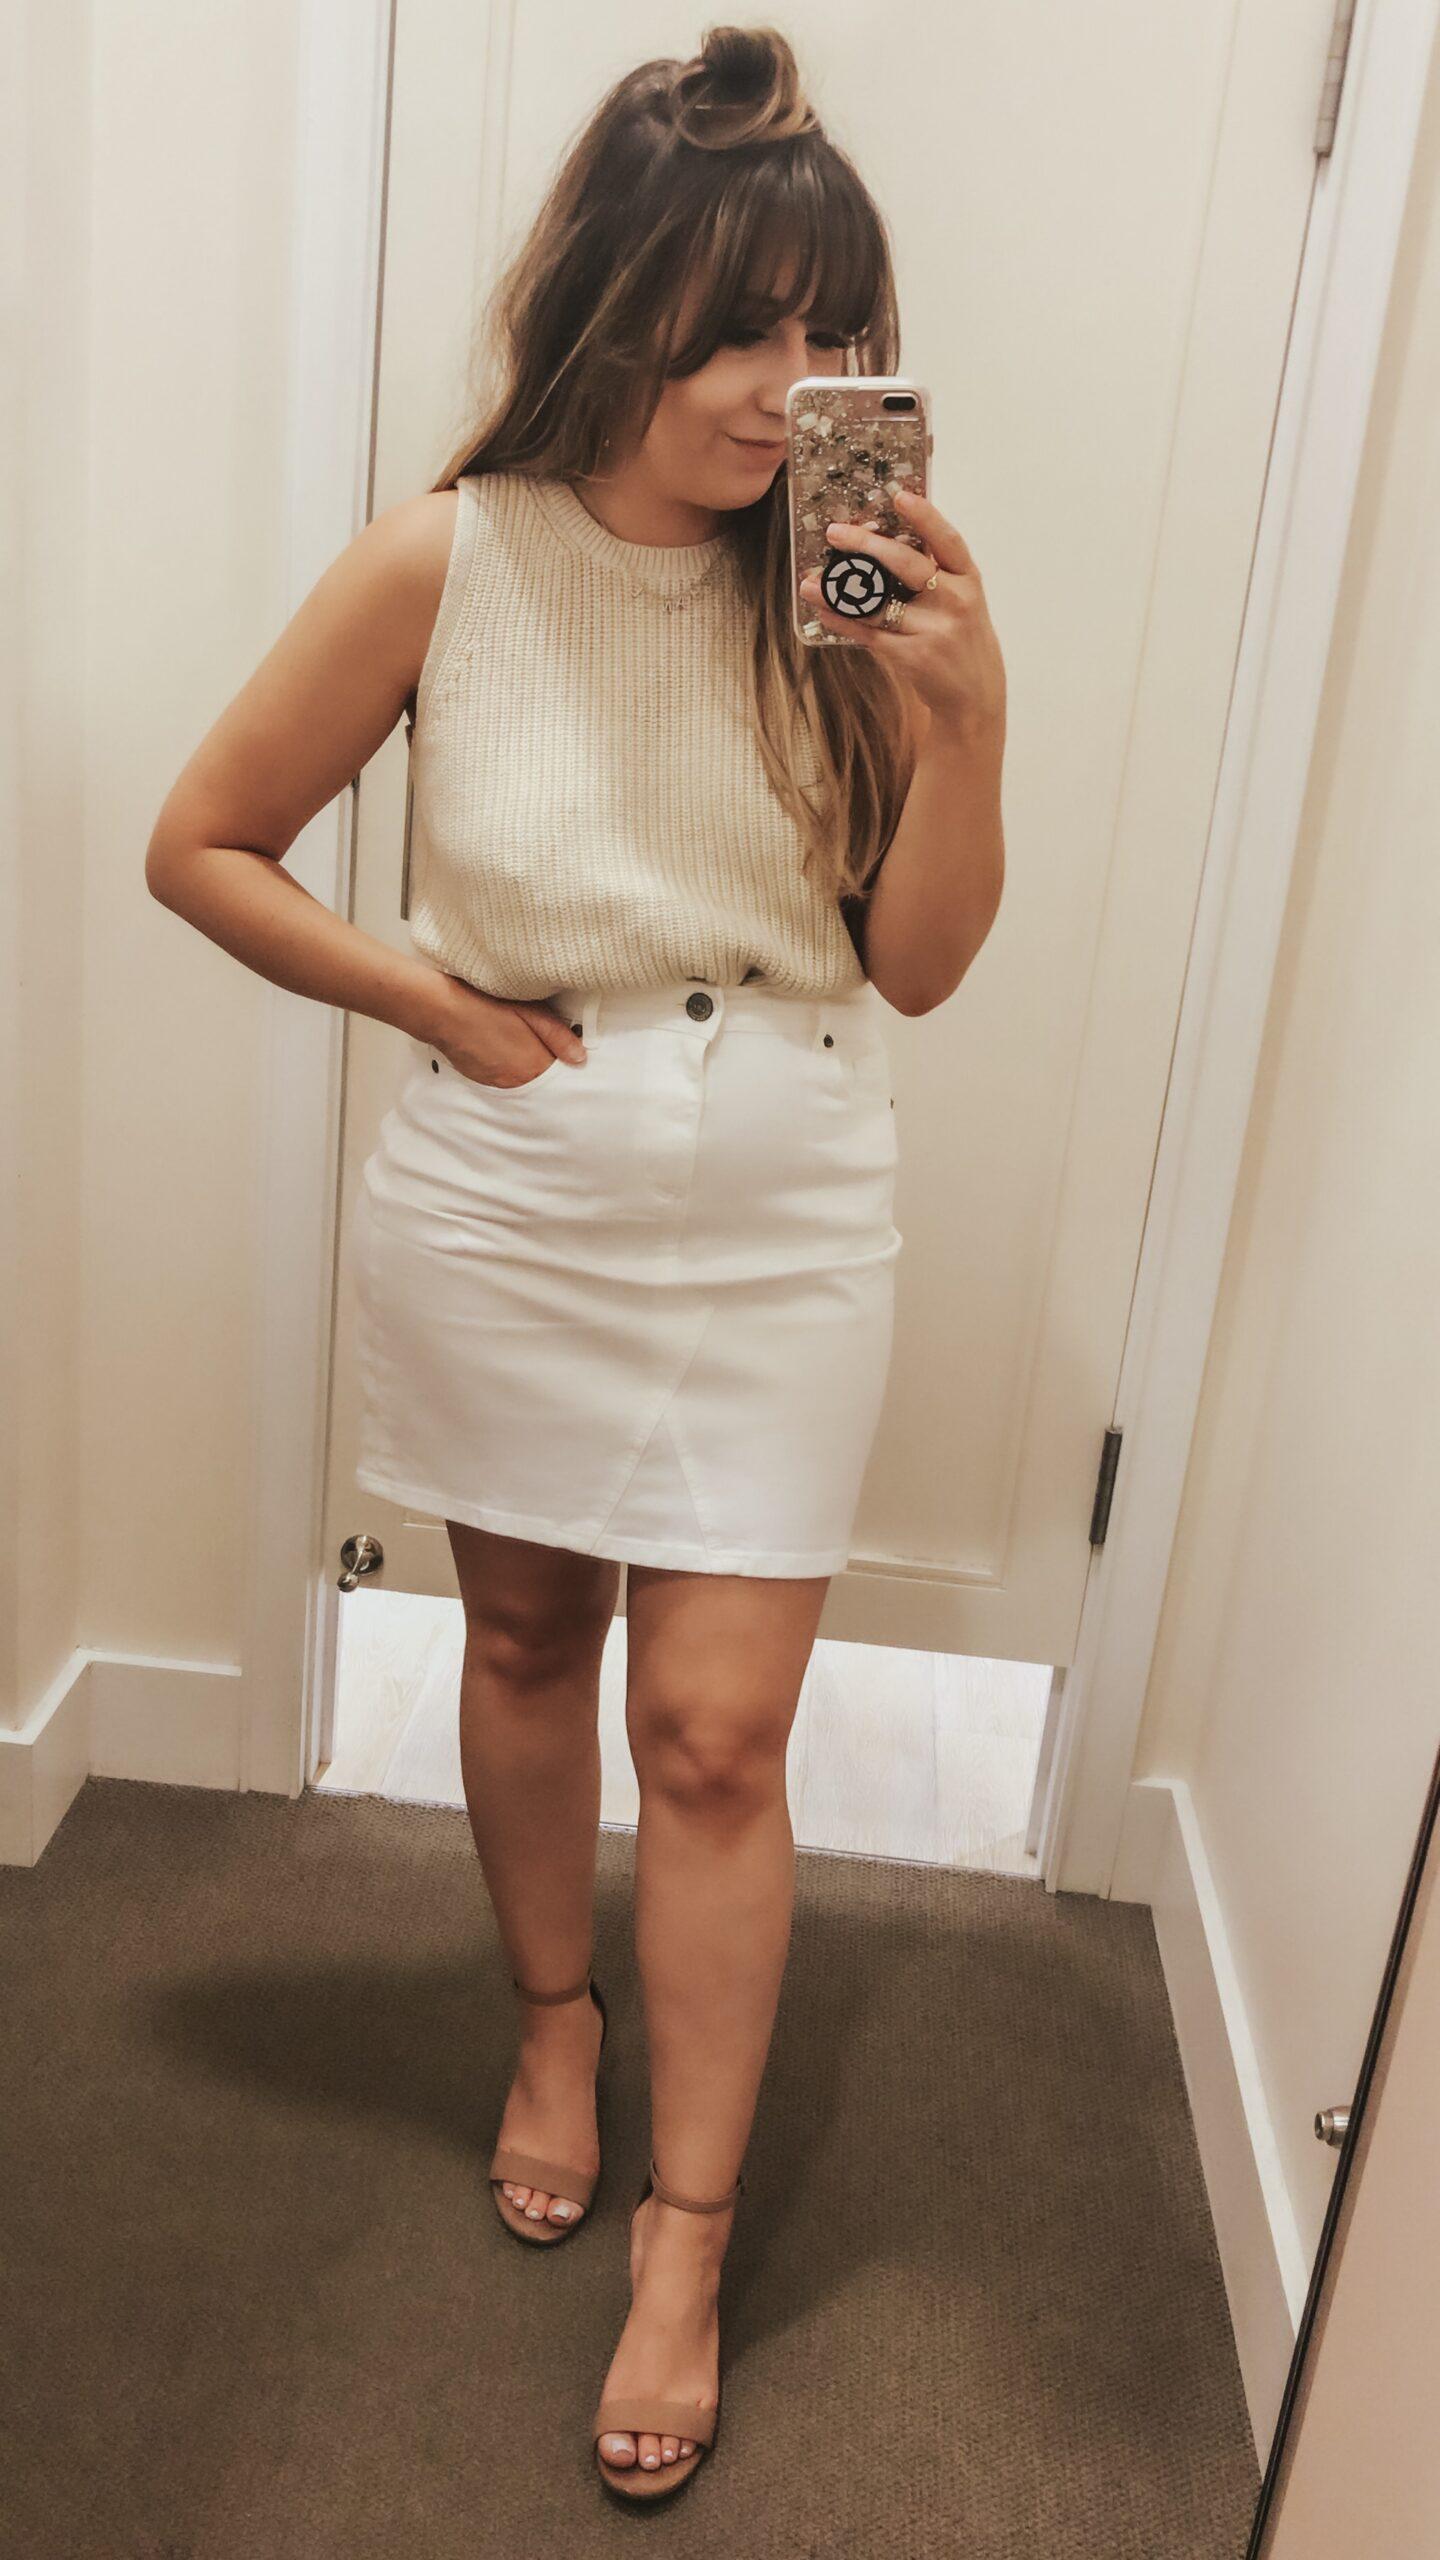 LOFT Spring - White jean skirt and Sleeveless sweater